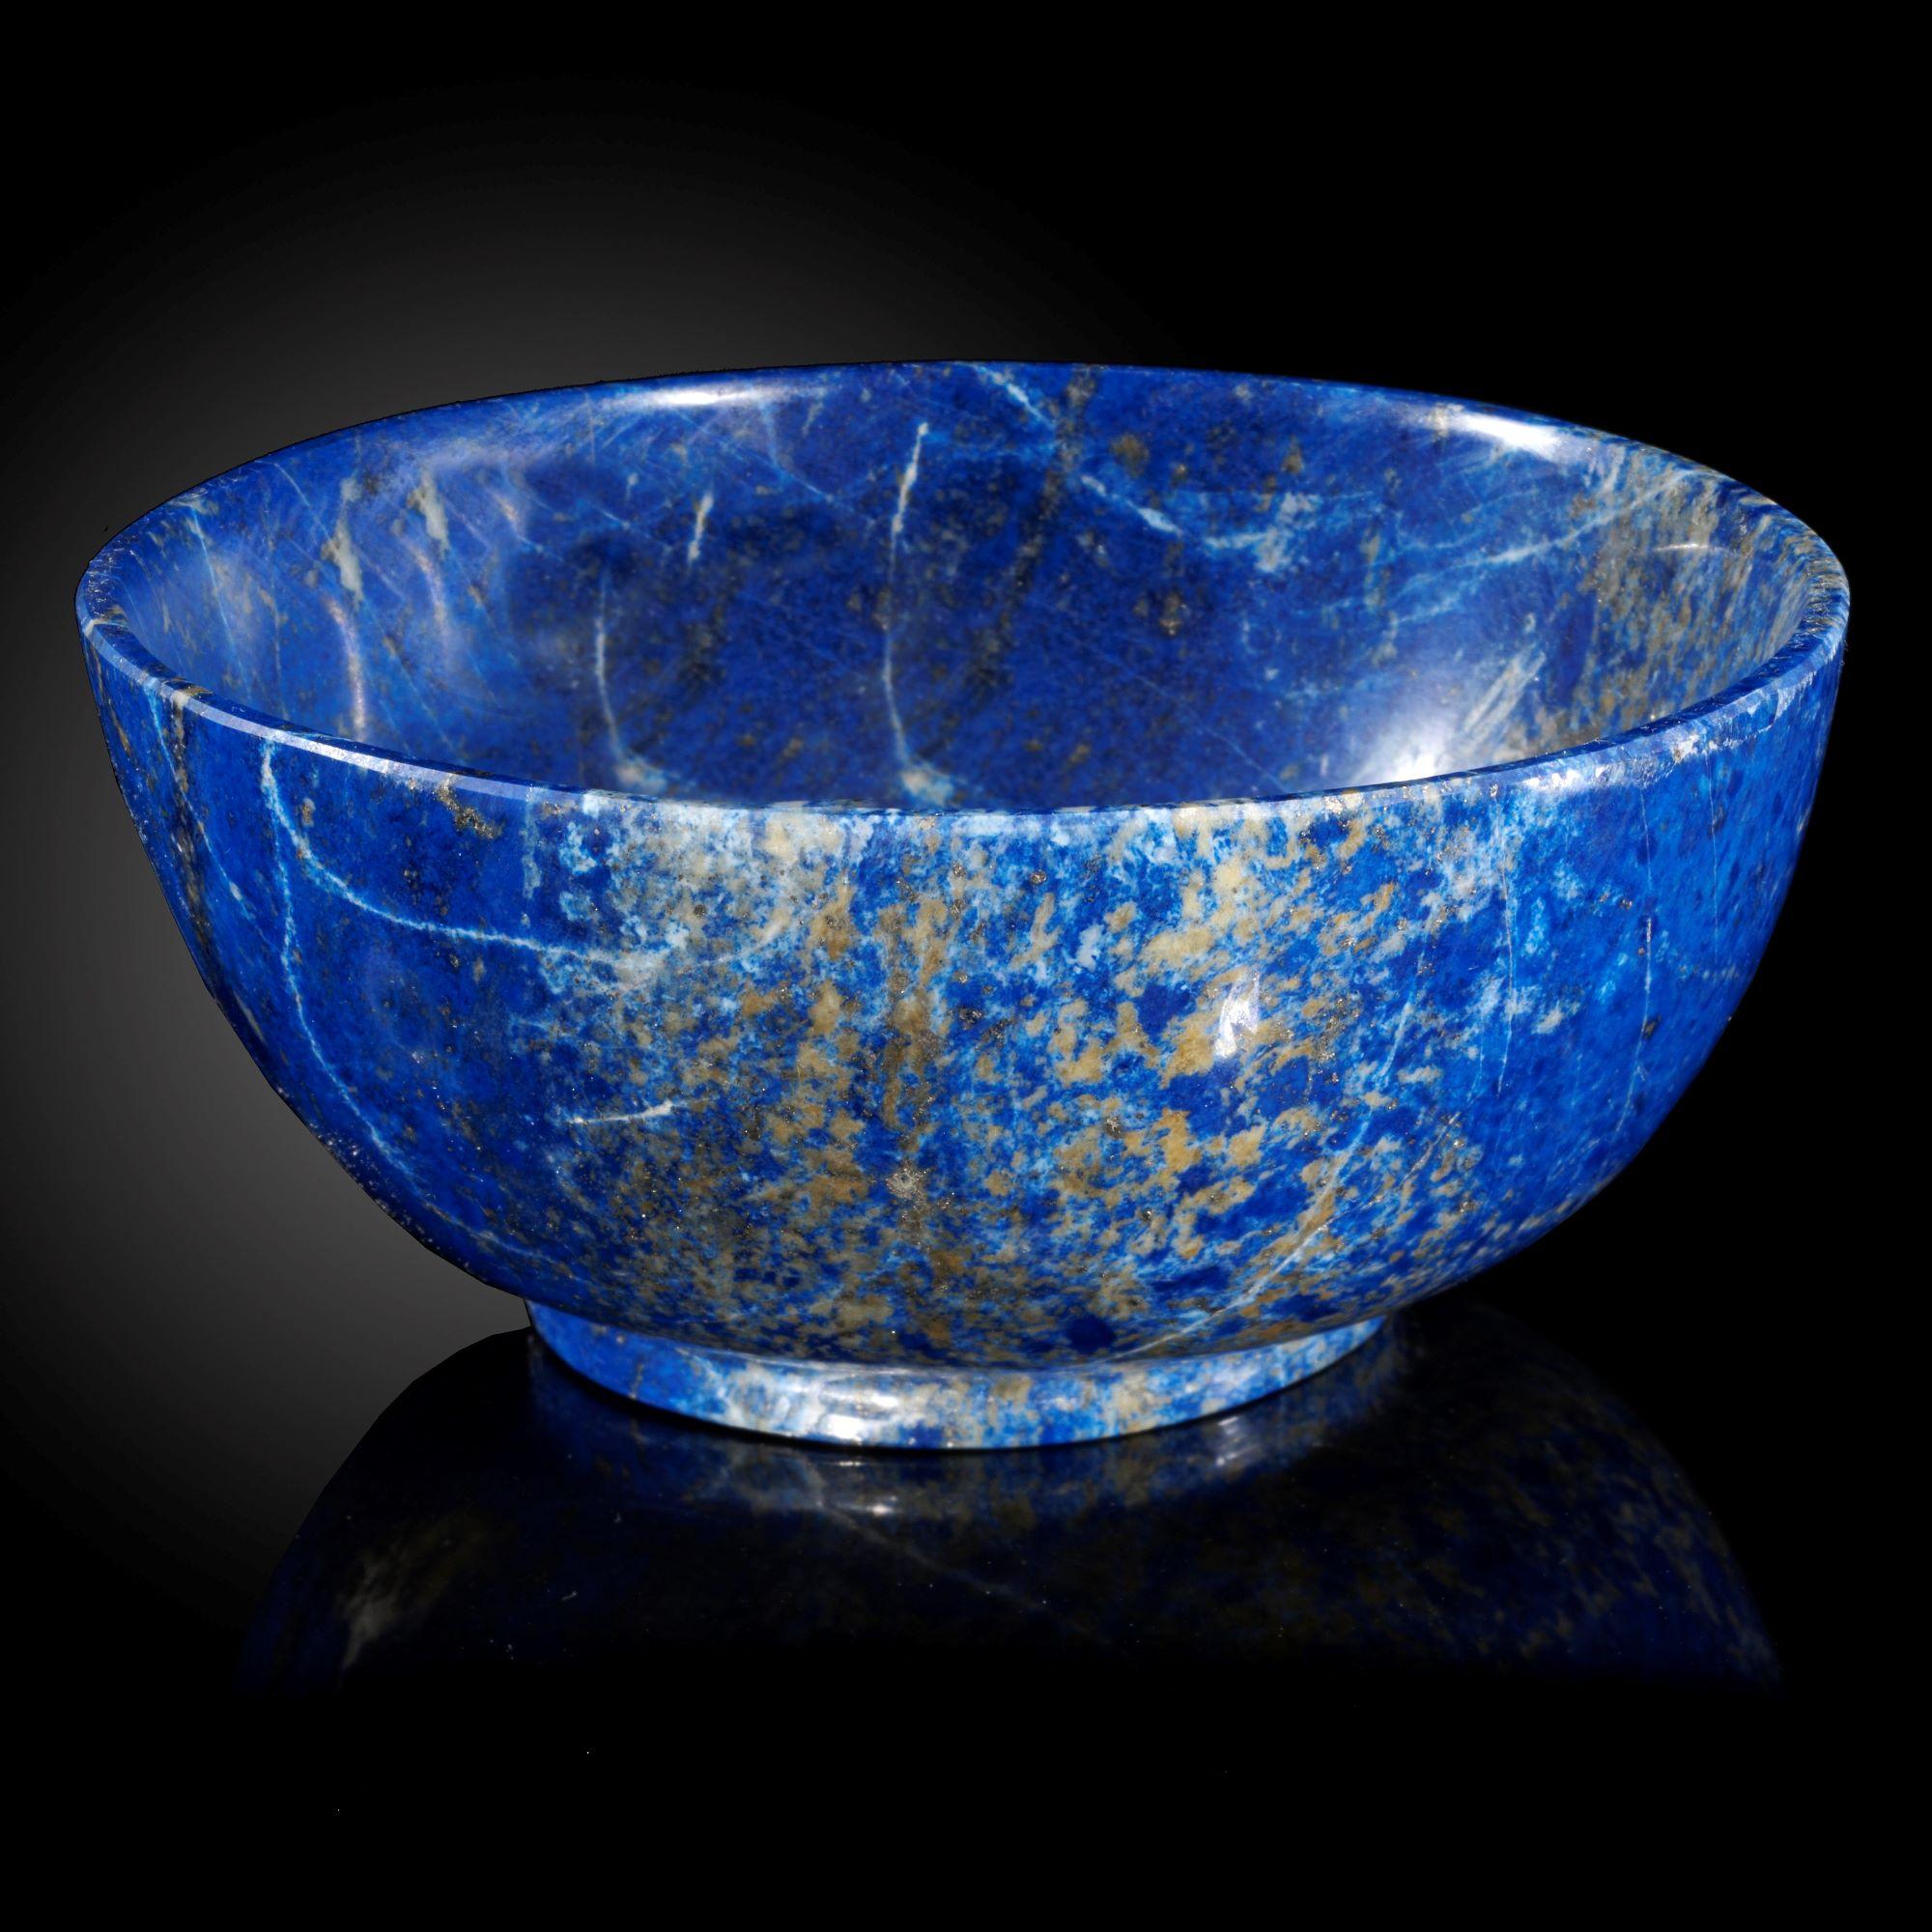 Lot 19 - Interior Design/Minerals: A Madani quality Lapis lazuli bowl, in presentation box, 12.5cm